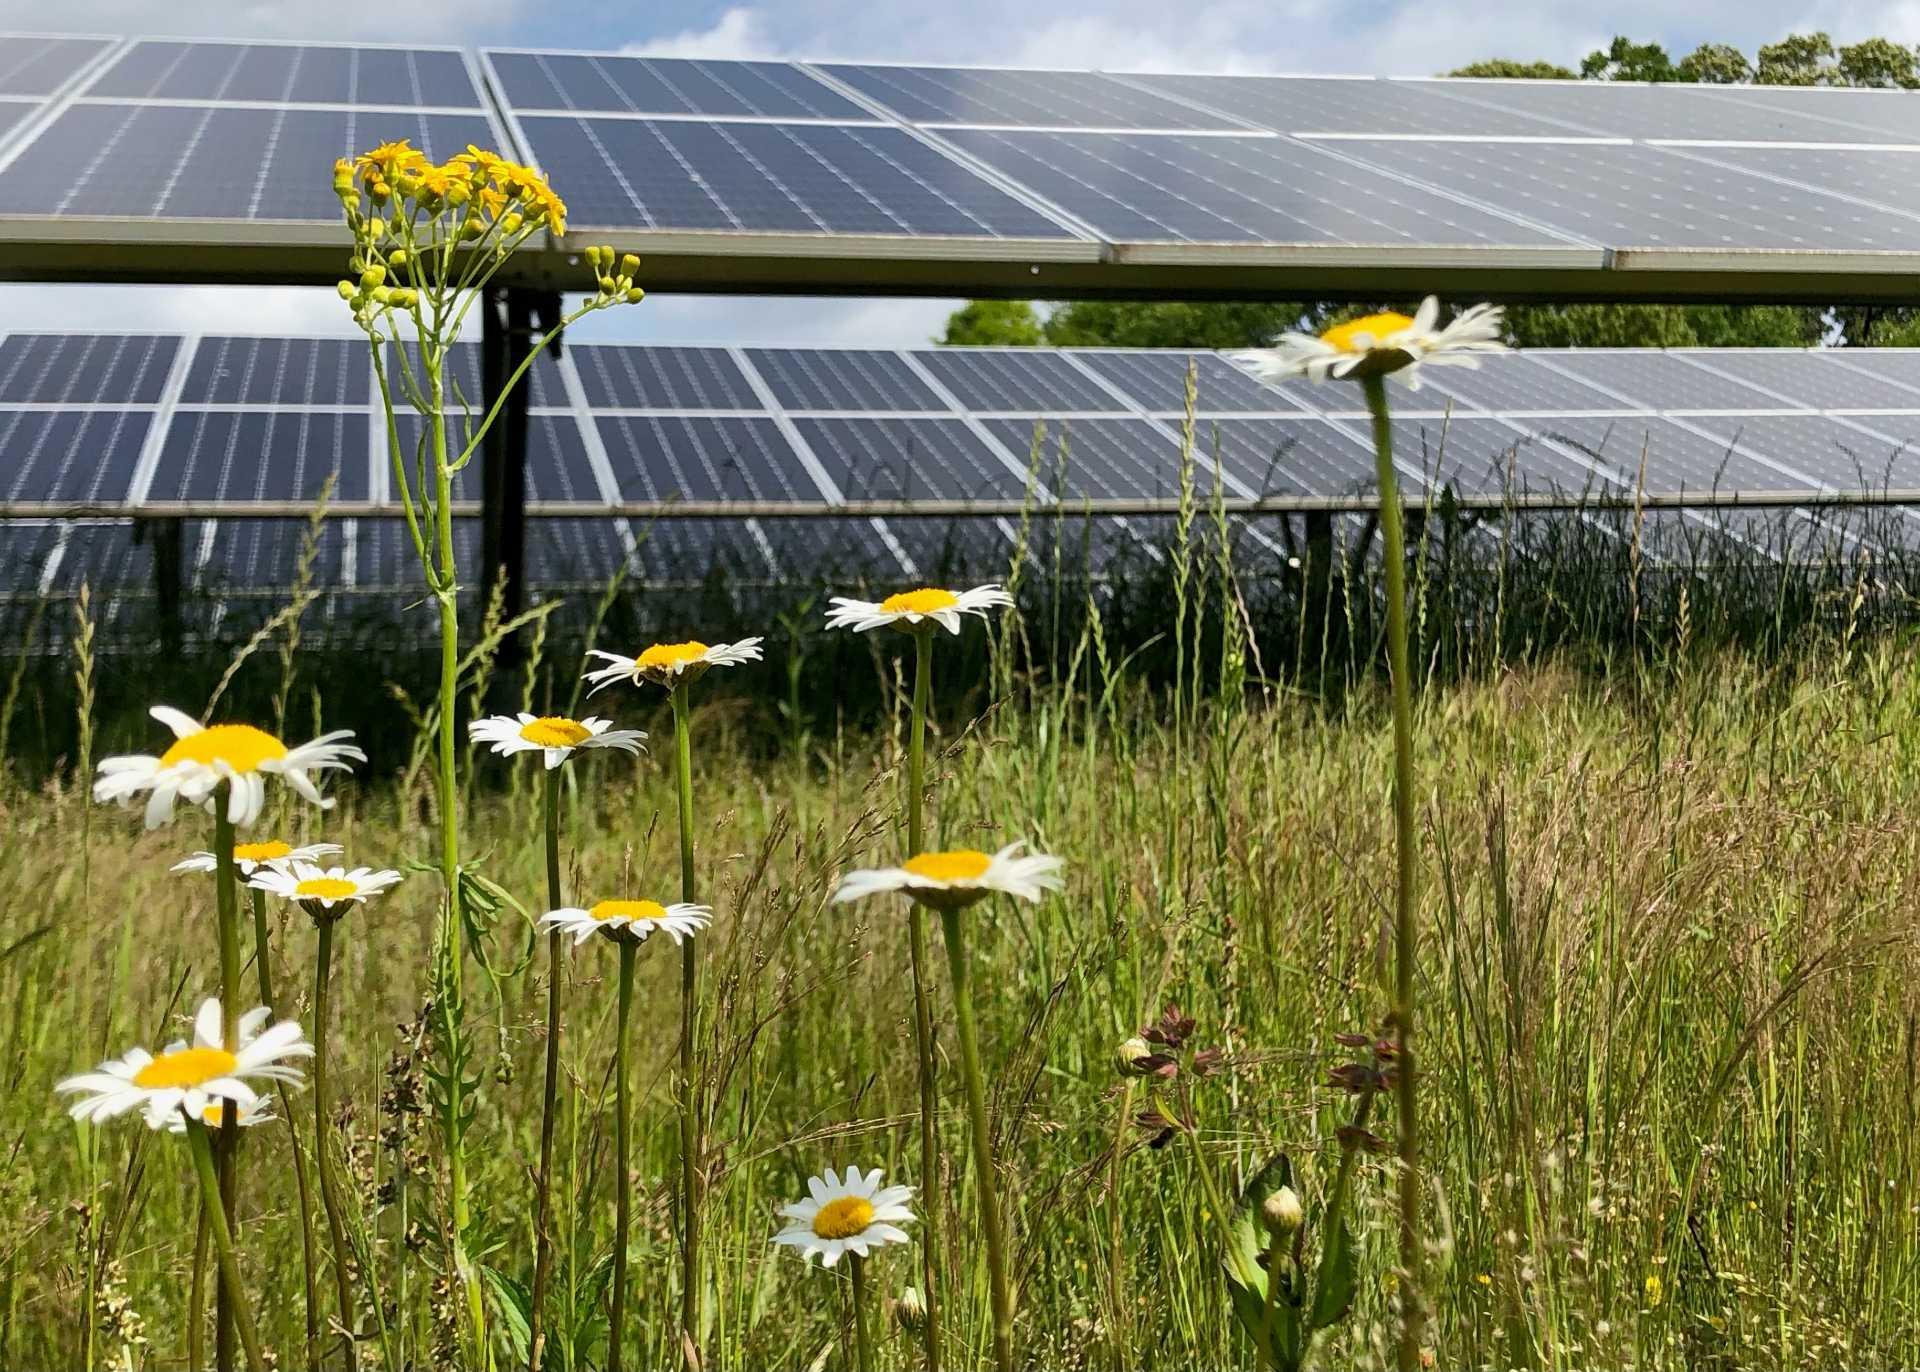 Drawdown Georgia- The Ray Pollinator Friendly Solar